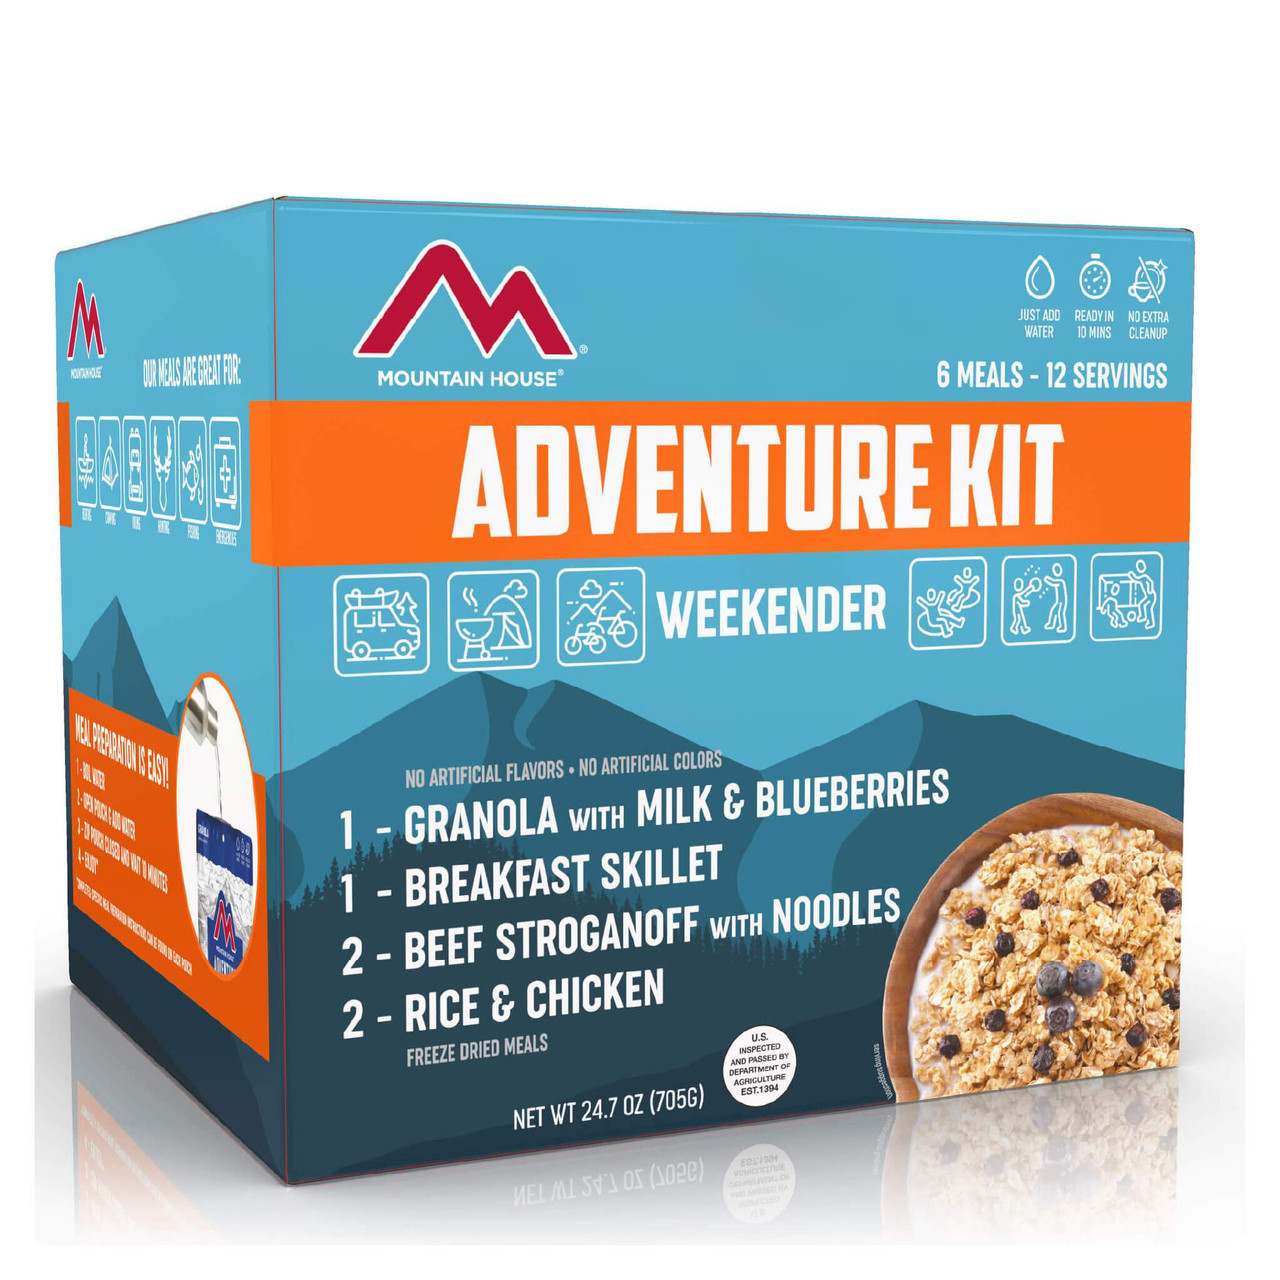 Mountain House Adventure Weekender Kit